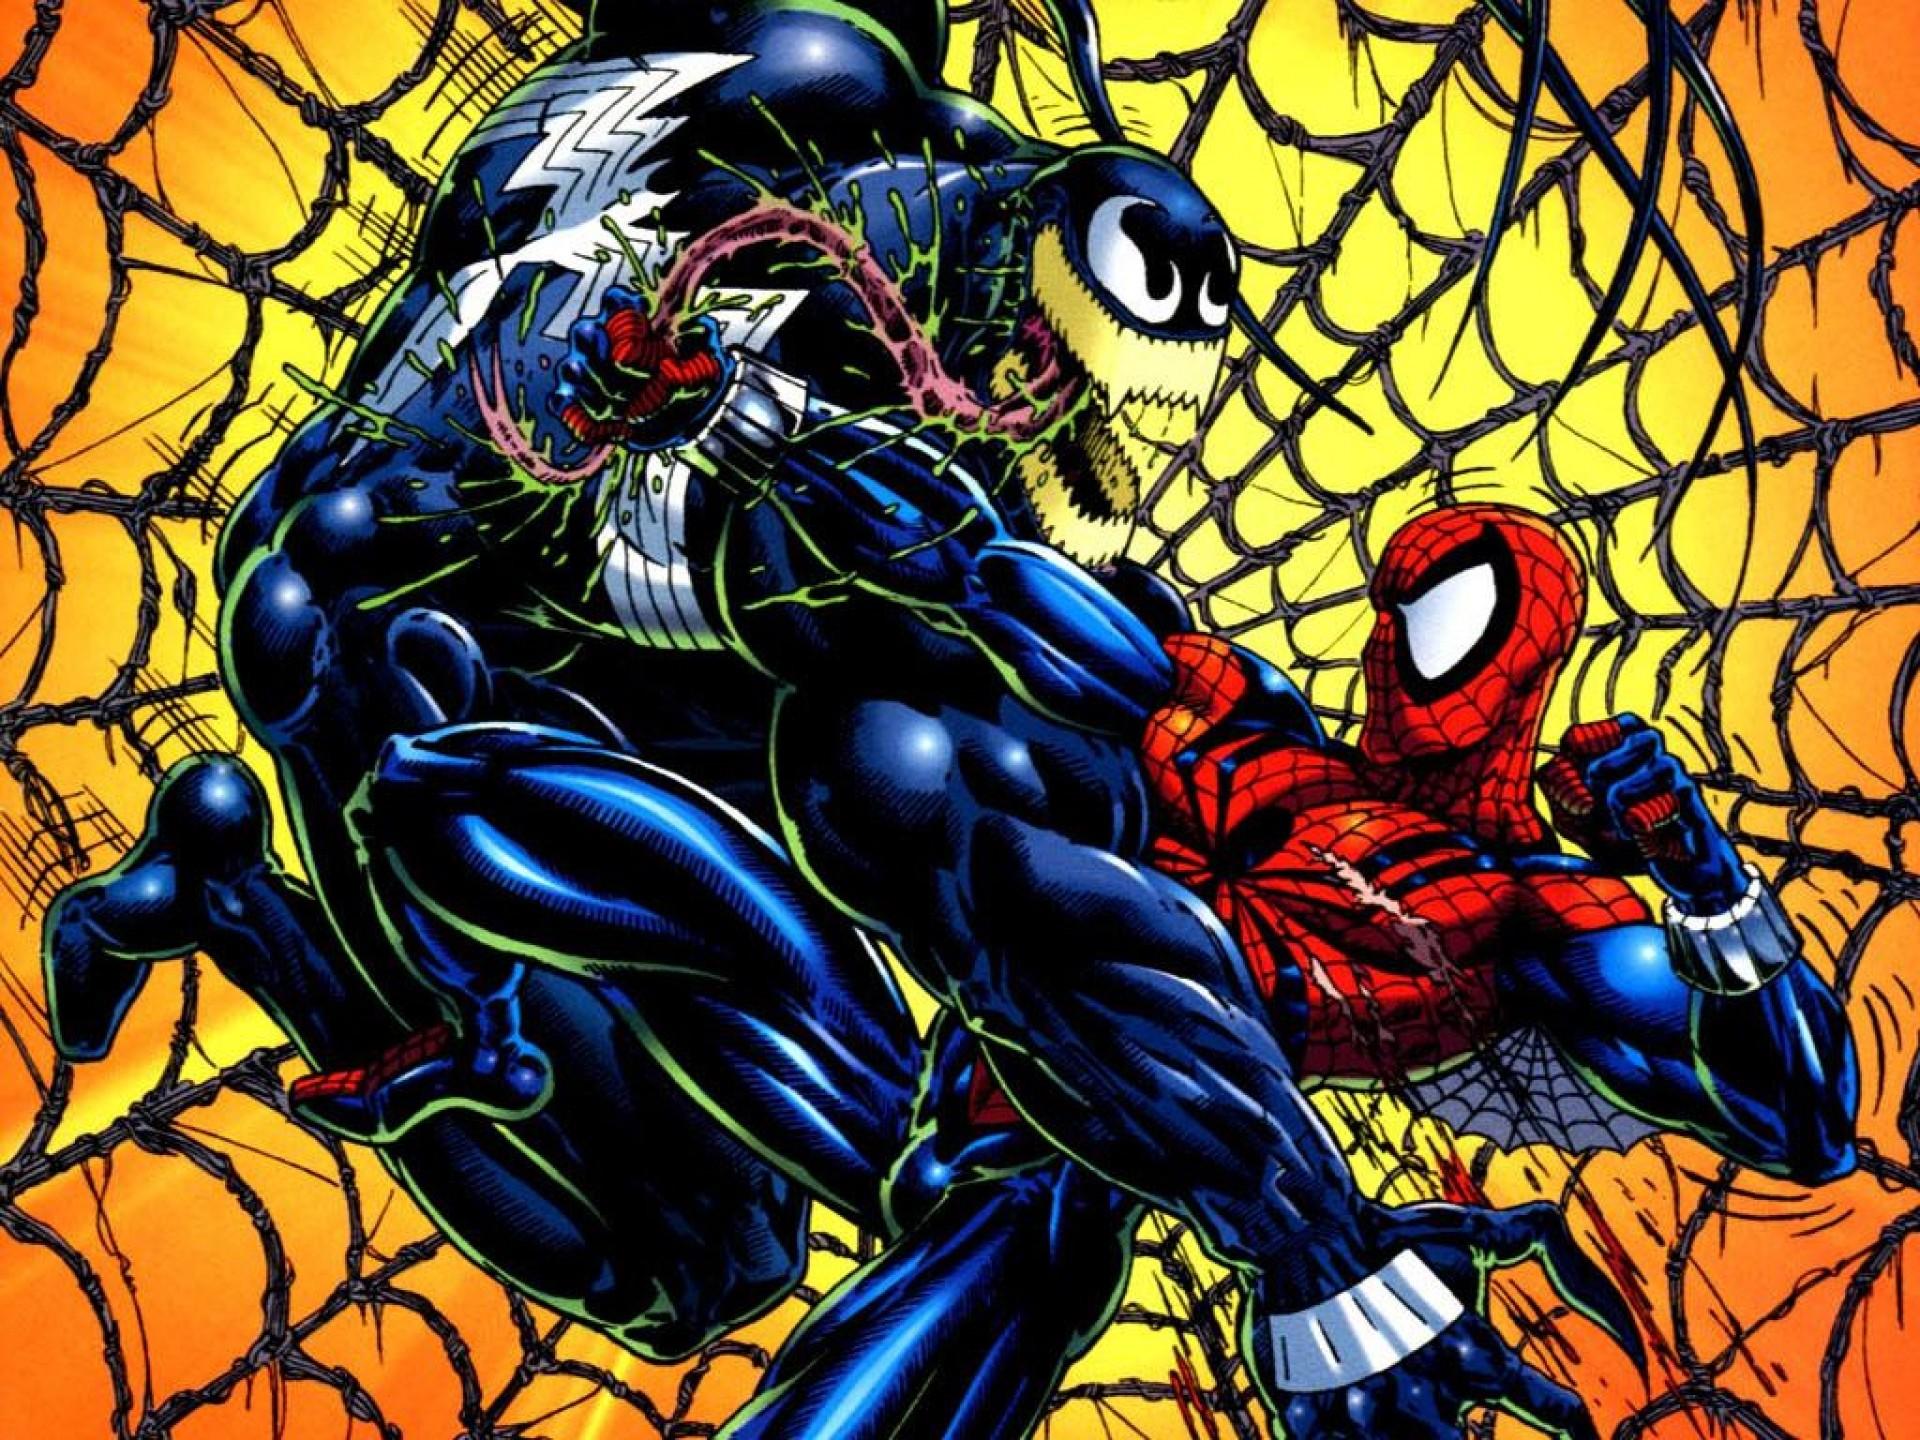 Venom vs Carnage Wallpaper (70+ images)